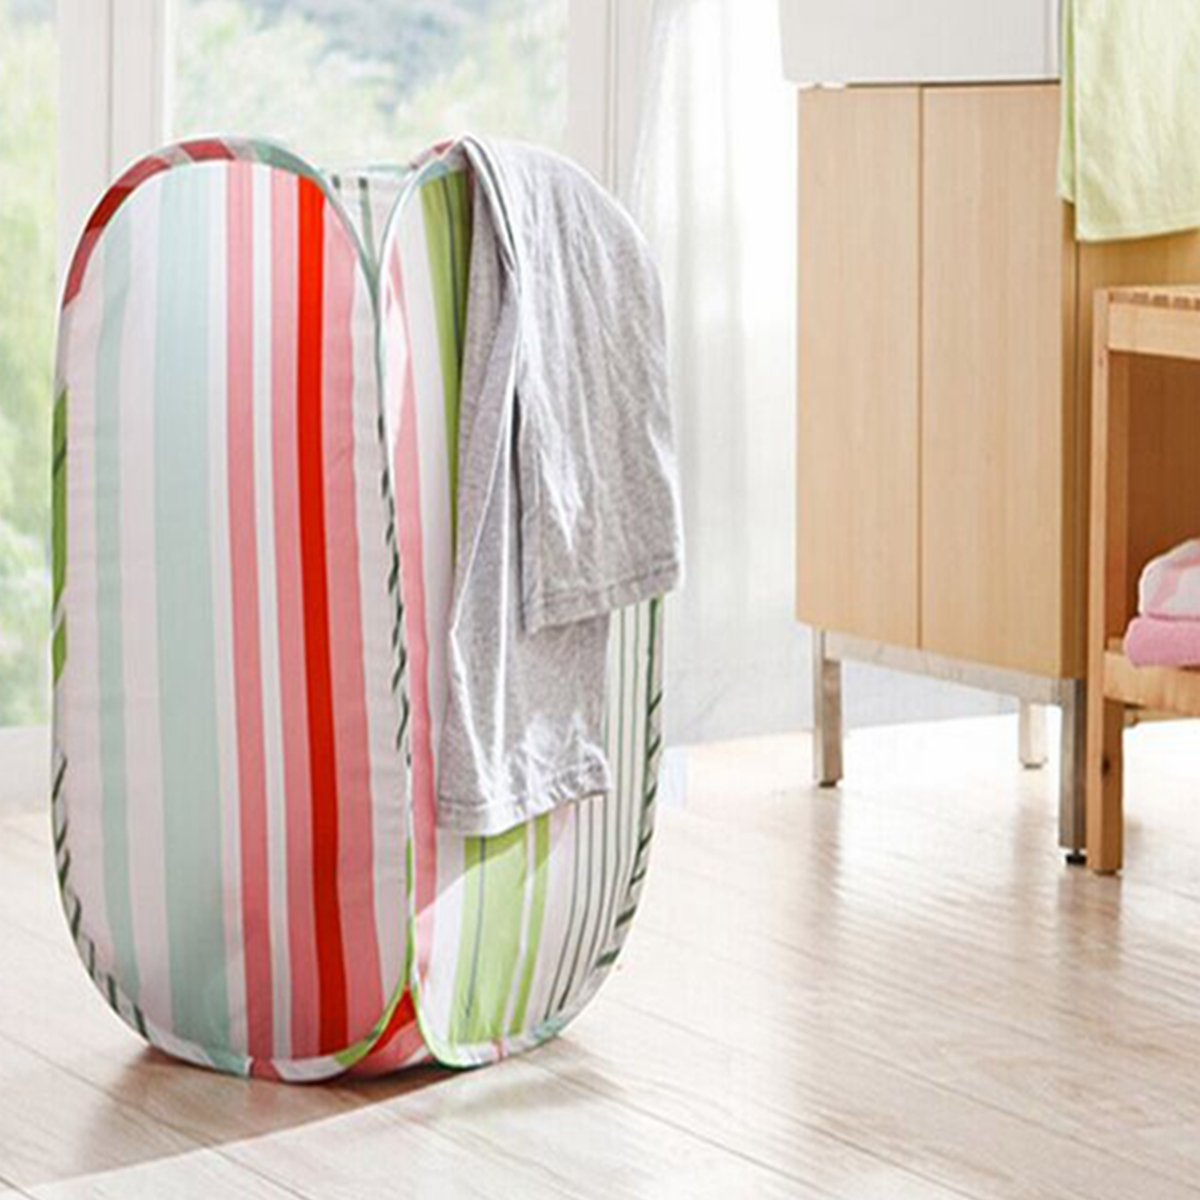 Foldable Pop Up Washing Clothes Laundry Bag Basket Bin Hamper Mesh Storage Ebay